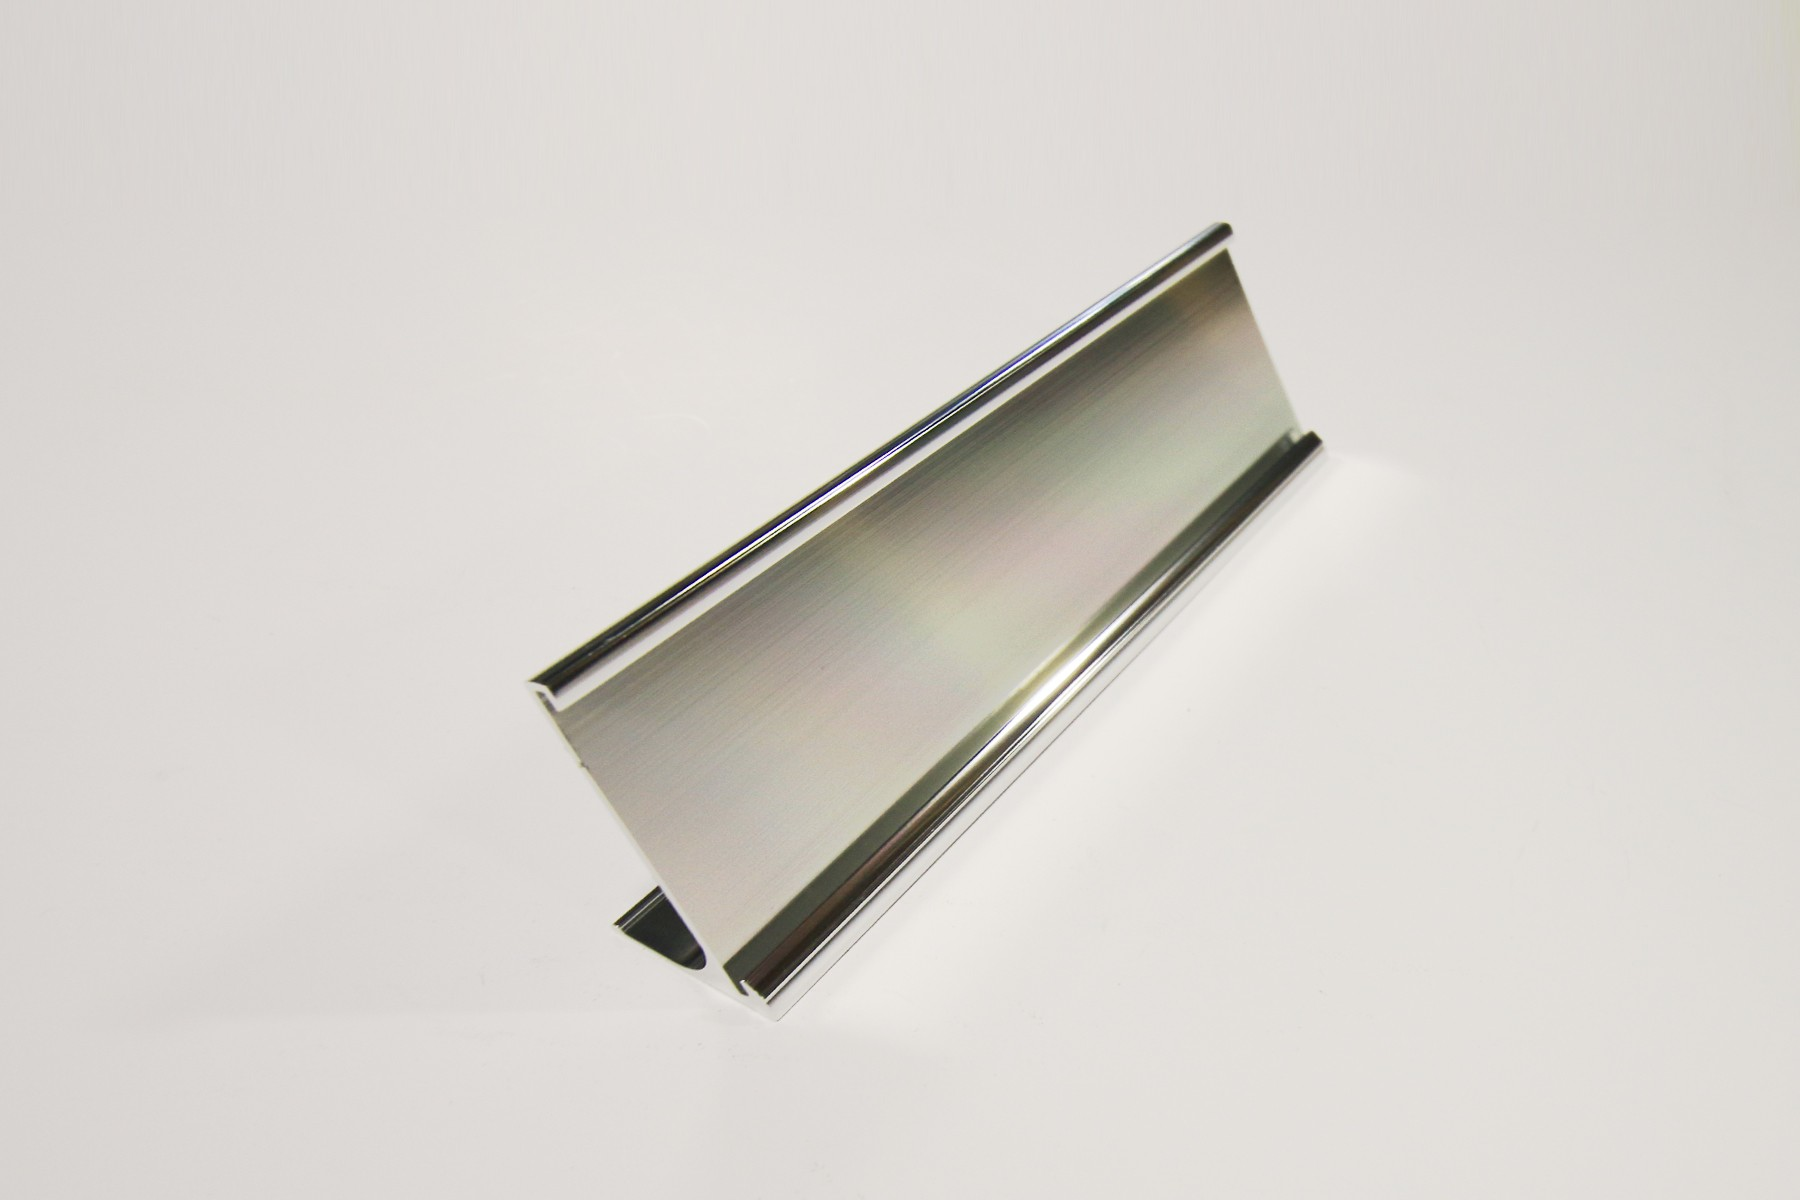 2 x 10 Desk Holder, Silver